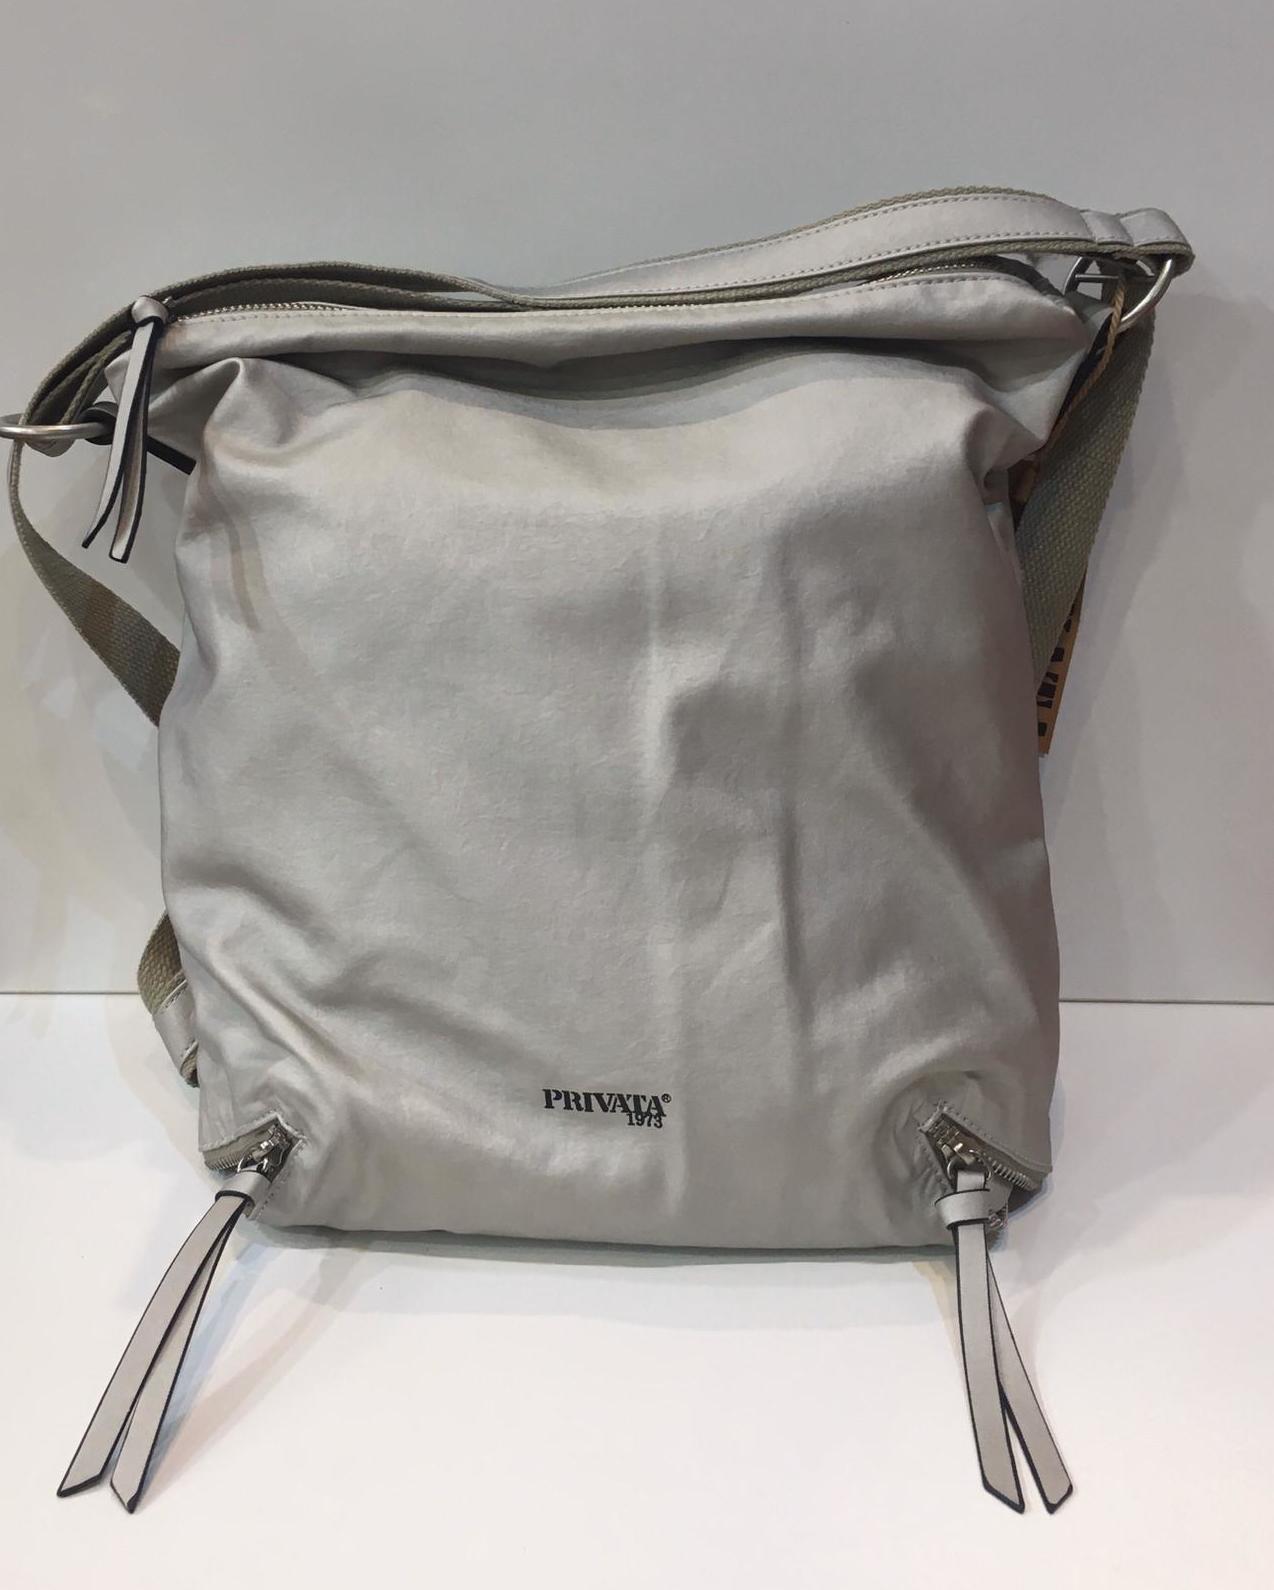 Bossa/Motxilla de la marca Privata, amb tires adaptables a bossa i a motxilla 56€